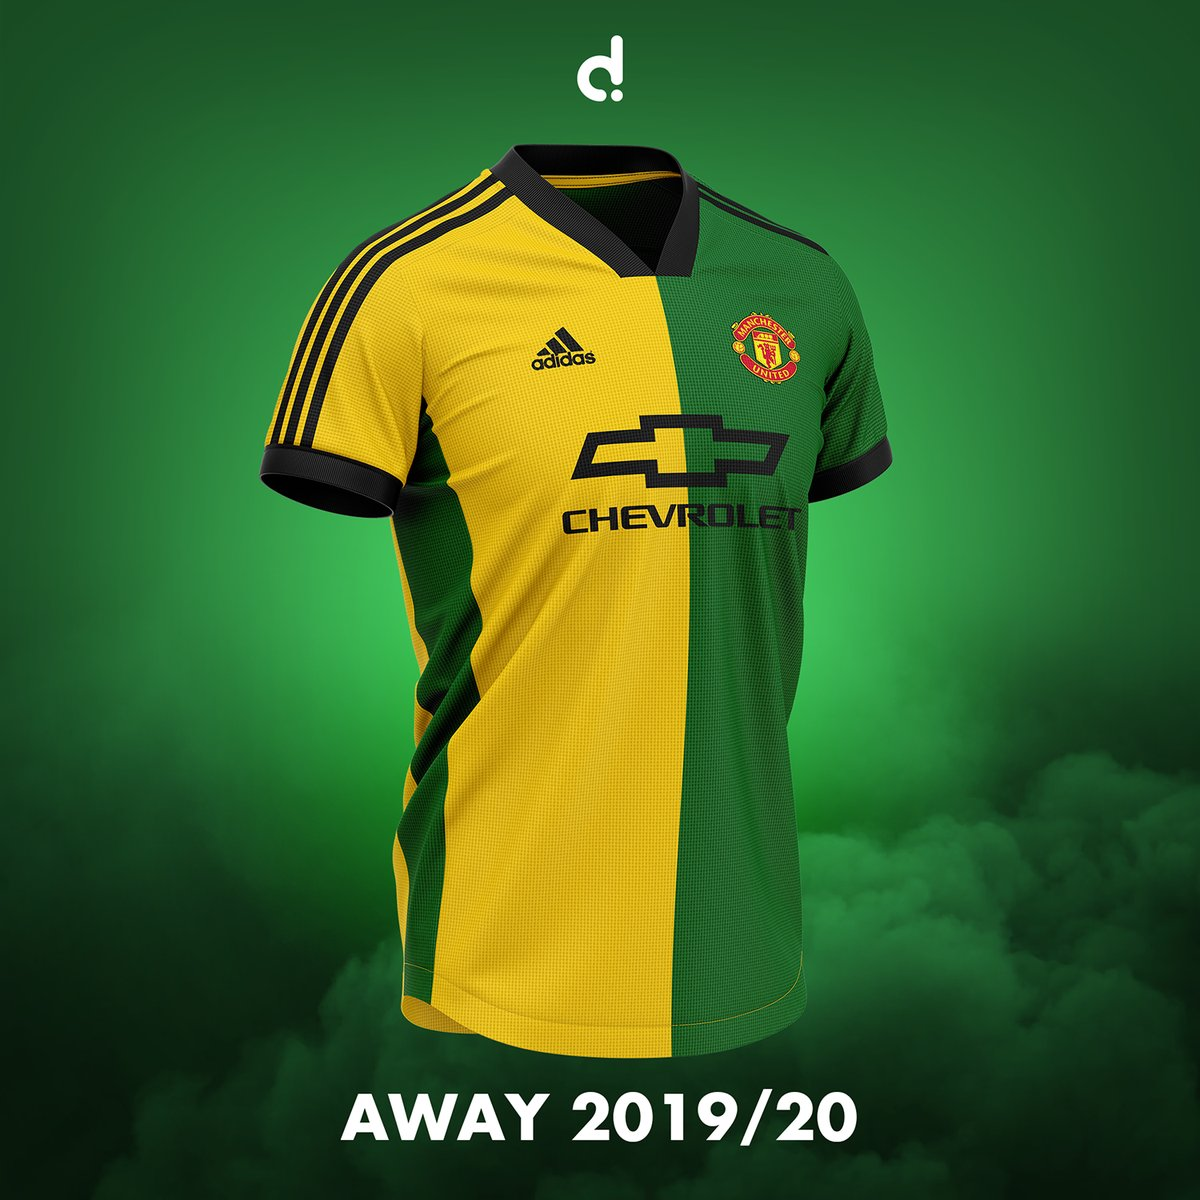 c2648318d (Image) Cracking new Man Utd concept kit based on Newton Heath colours  drops online